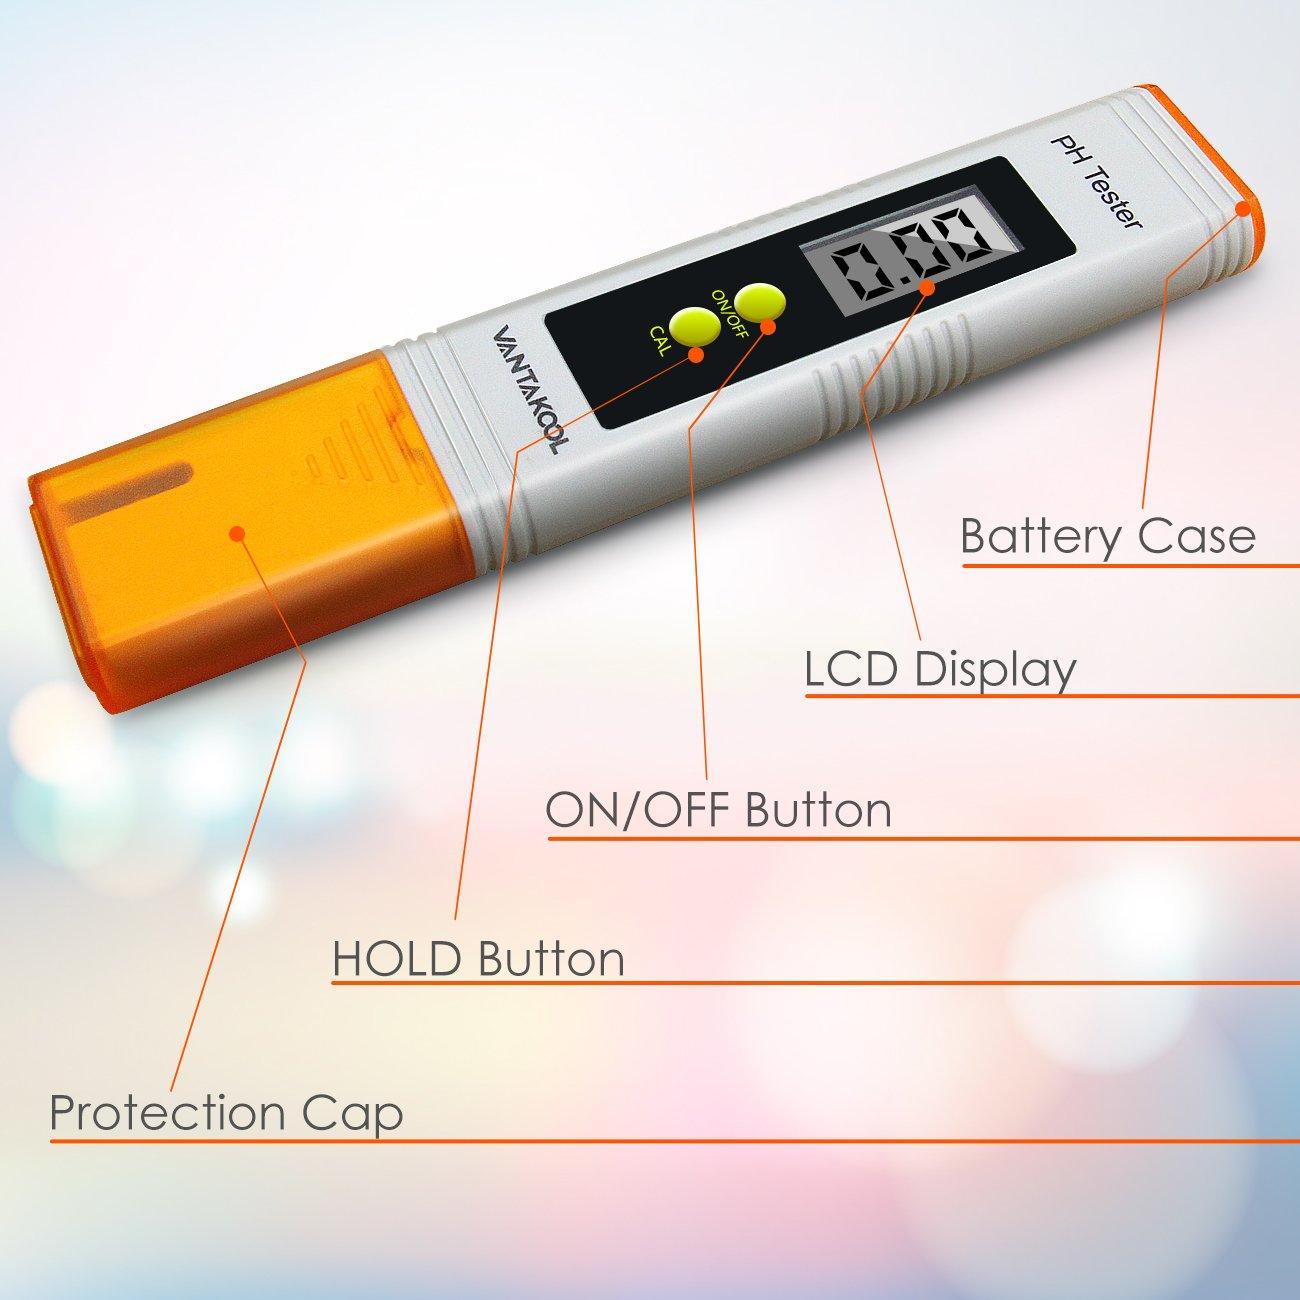 VANTAKOOL Digital PH Meter, 0.01 PH High Accuracy Pocket Size PH Meter/PH Tester with 0-14.0 Measuring Range, Water Quality Tester for Household Drinking Water, Swimming Pools, Aquariums (Orange) by VantaKool (Image #5)